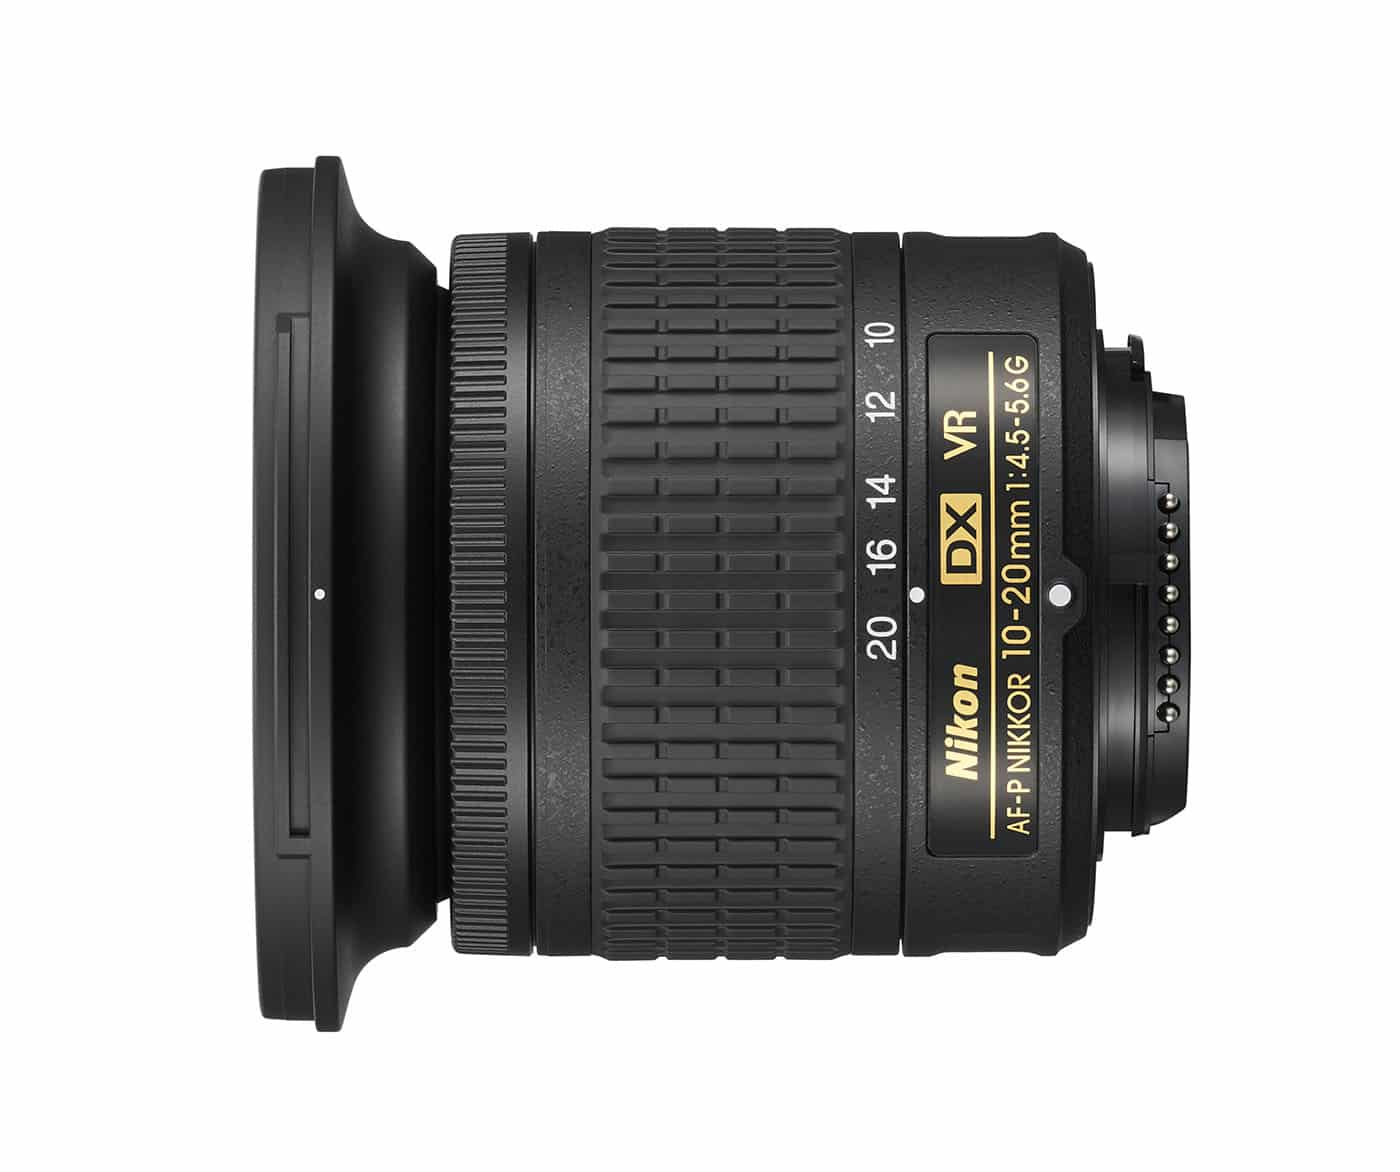 Service-Hinweis Nikon D750 + neues Nikon AF-P DX 10-20 mm.